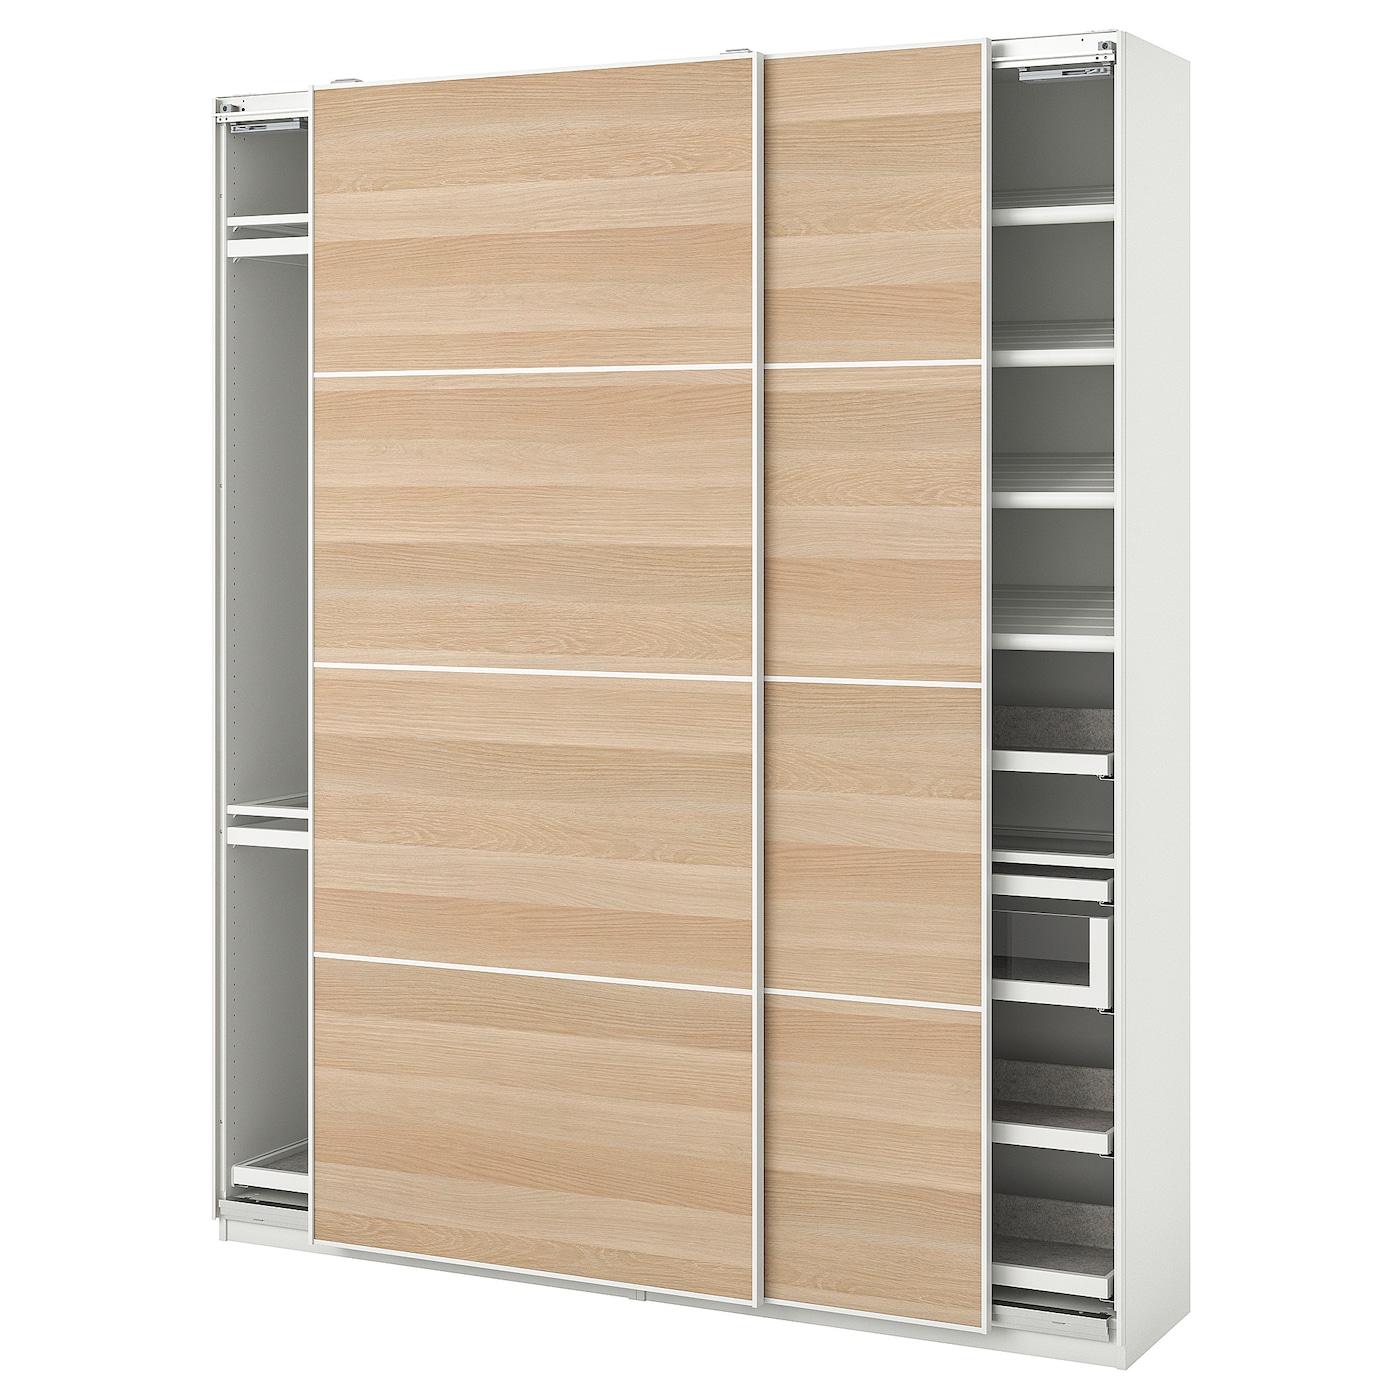 Pax Mehamn Combinaison Armoire Blanc Effet Chene Blanchi 200x44x236 Cm Ikea